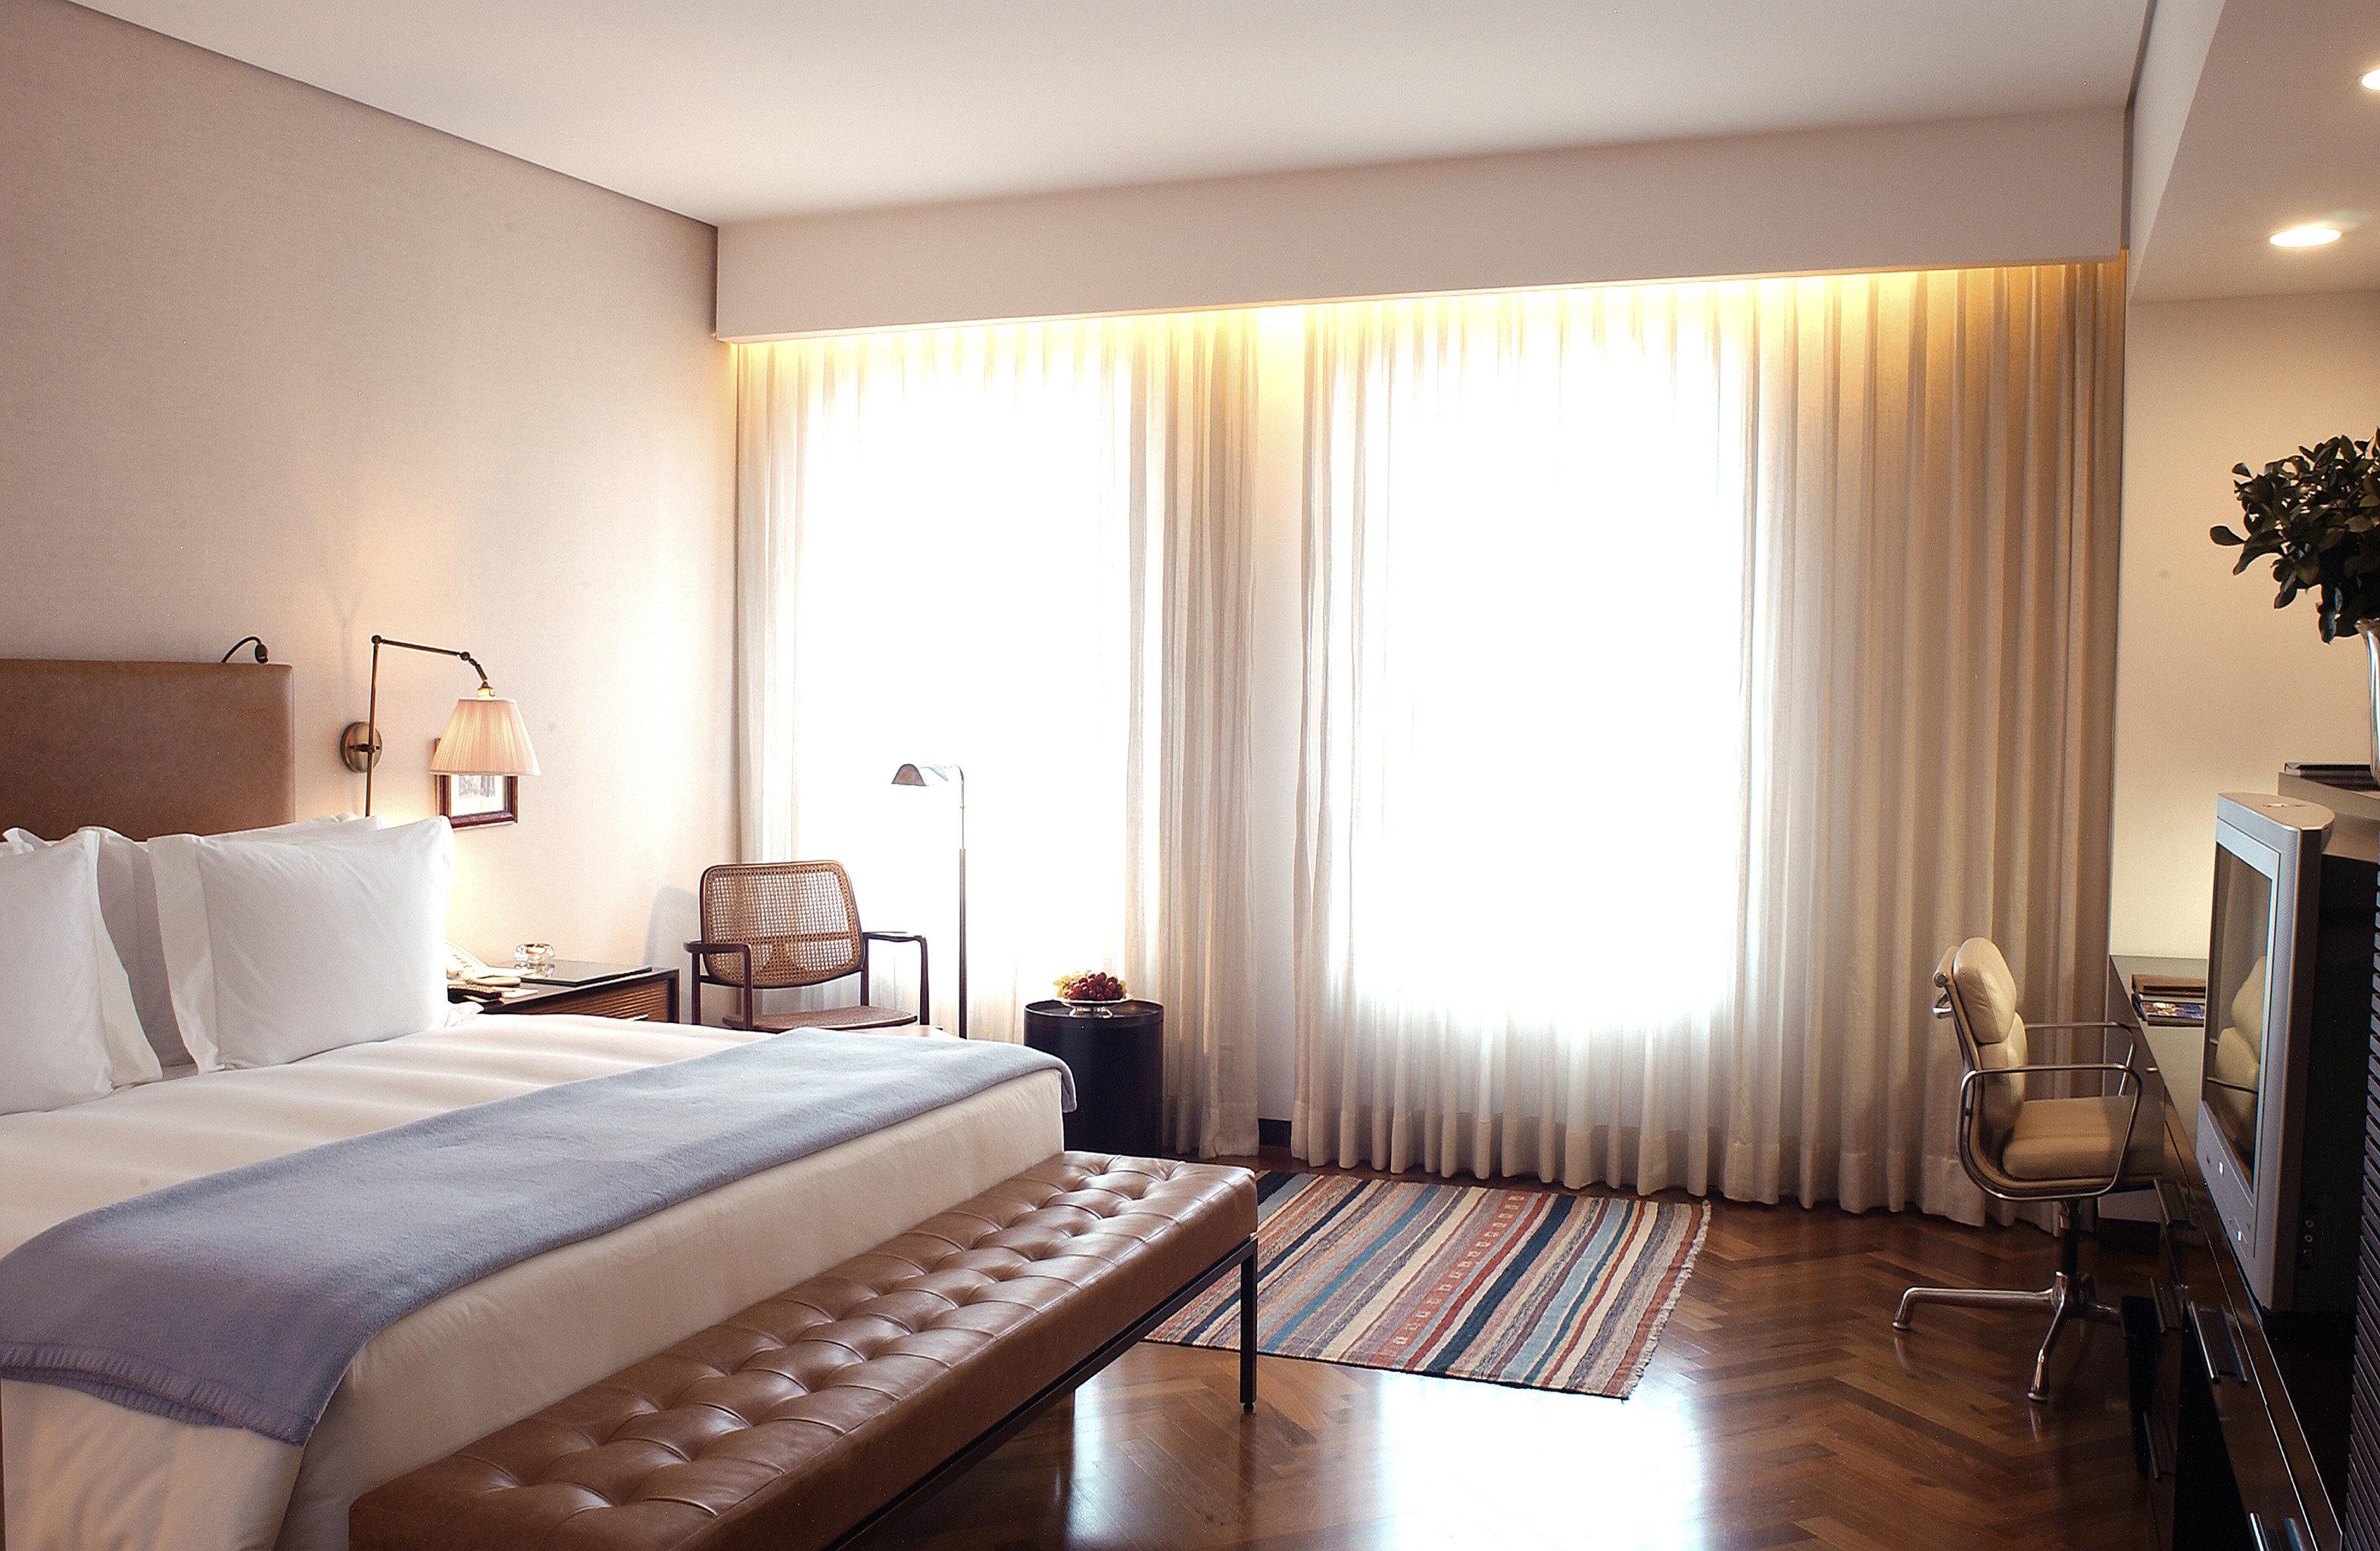 Bedroom Elegant Lounge Luxury Suite sofa property condominium cottage living room flat